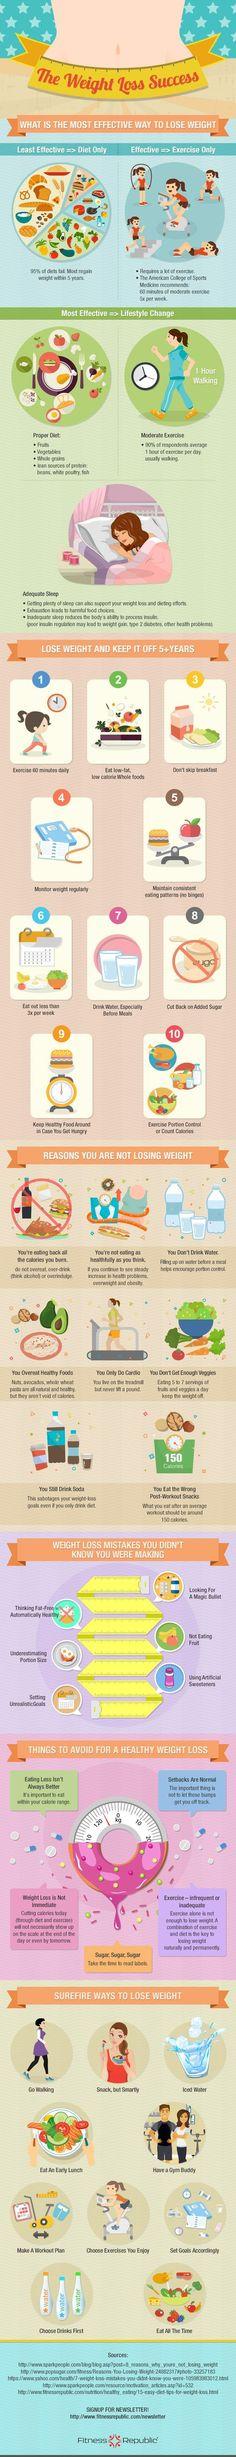 How to Weight Loss Success #weightloss #reducebellyfat #fatloss #howtolosefat #weightlossplan #lose10pounds #loseweightfast